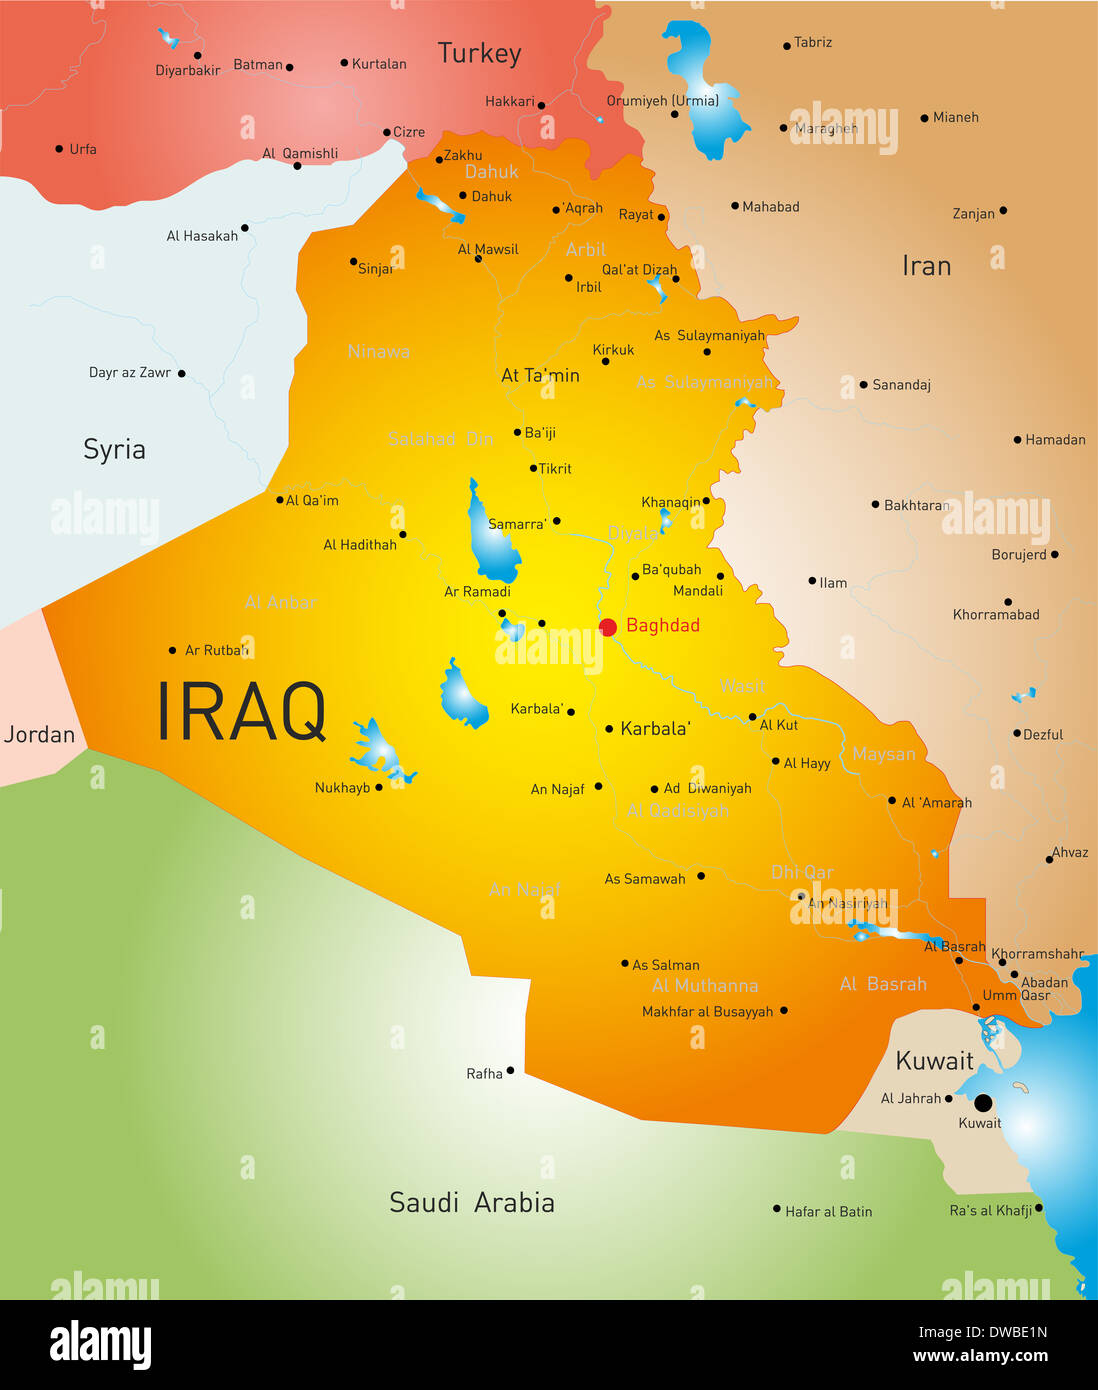 Iraq country stock photo 67250001 alamy iraq country gumiabroncs Choice Image